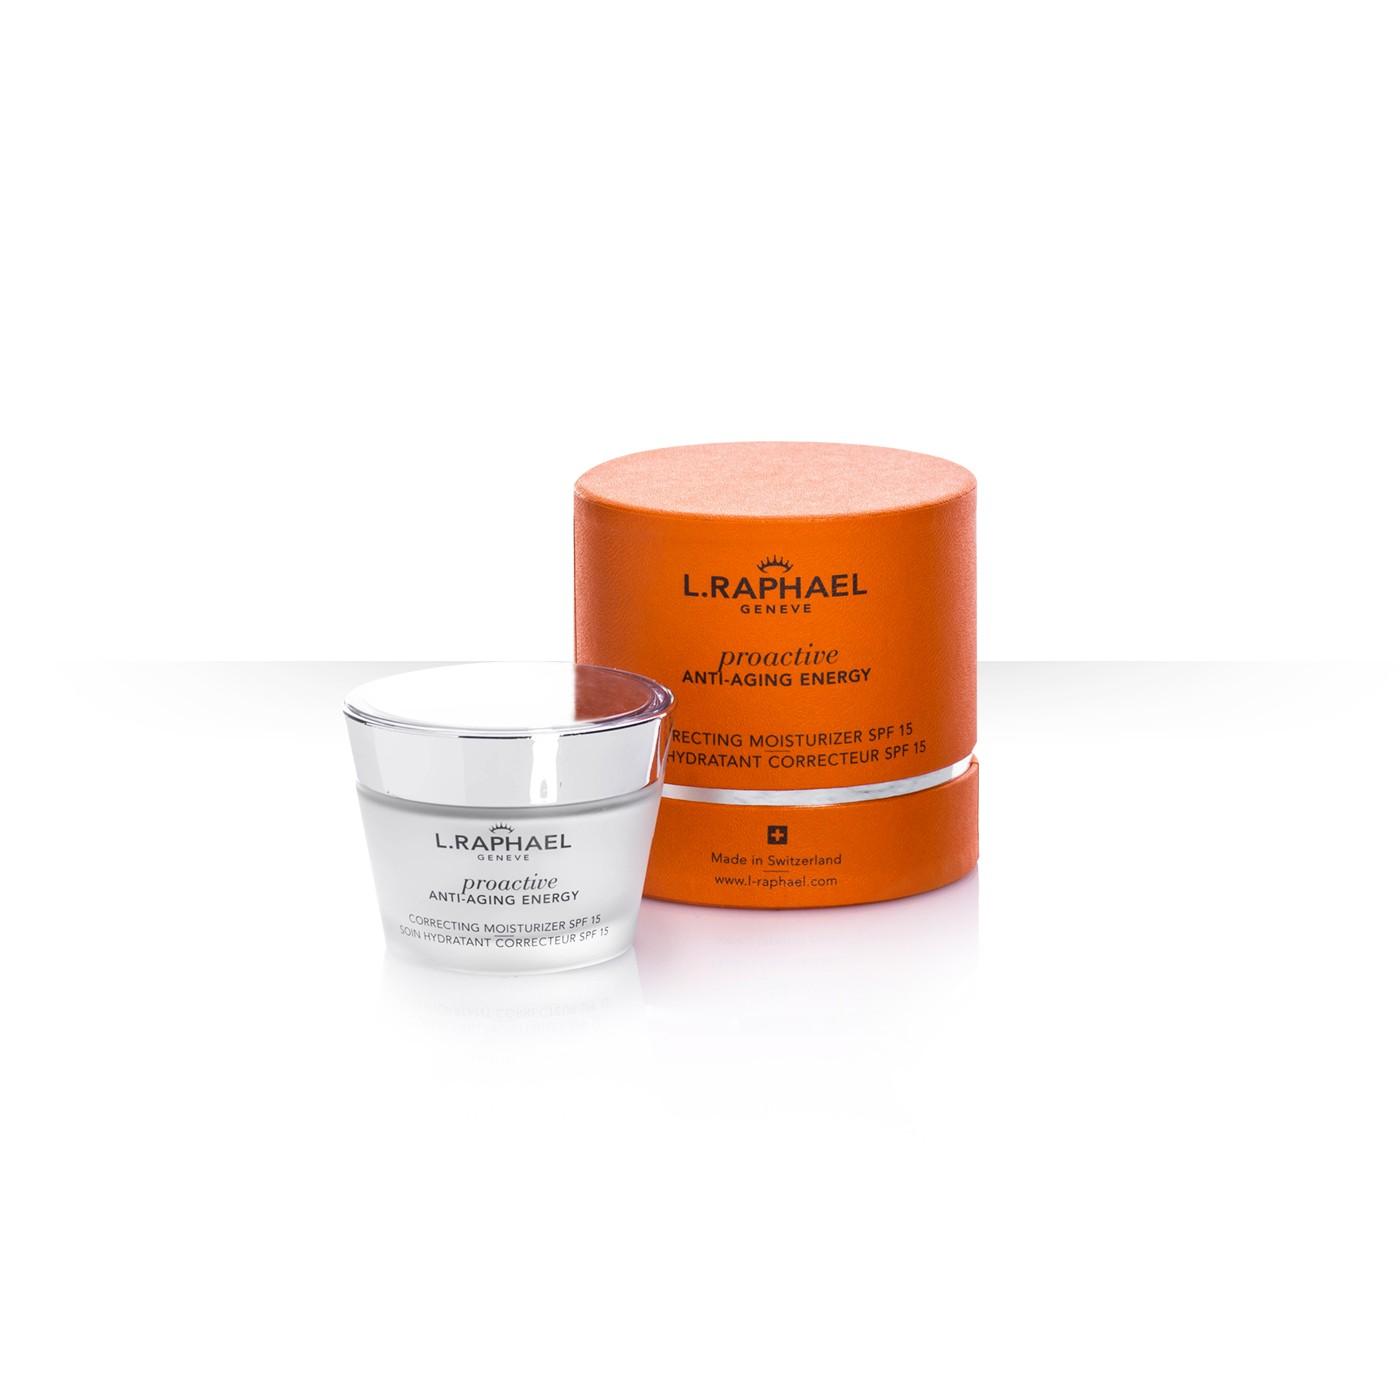 Correcting moisturizer SPF15 (Non disponible aux USA)